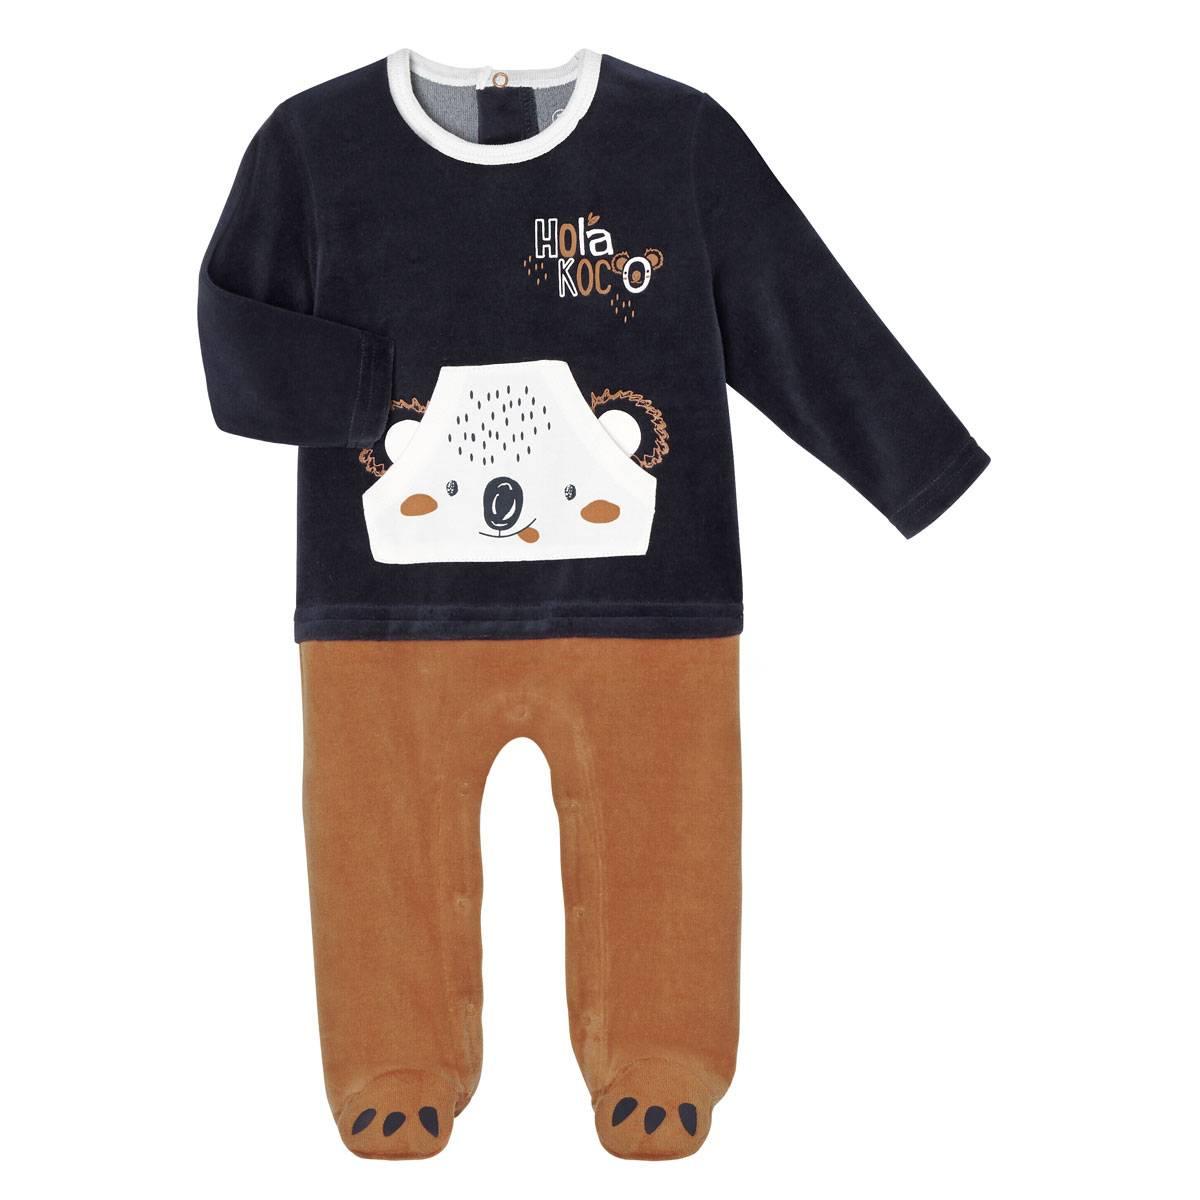 Pyjama bébé velours Hola Koco